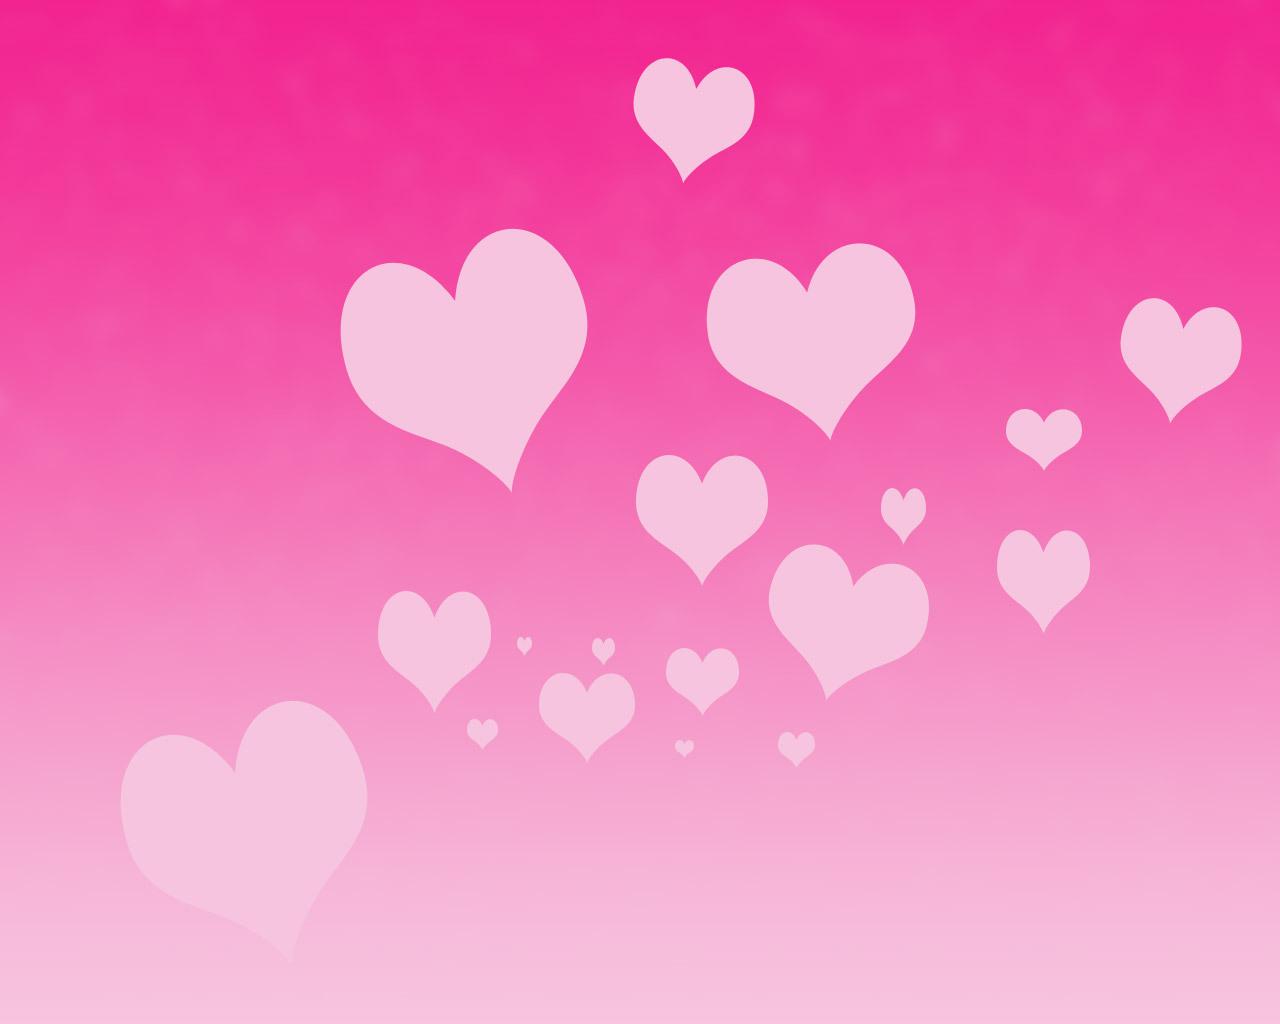 Love Wallpaper In Pink colour : Pink wallpaper - Pink (color) Wallpaper (10579408) - Fanpop